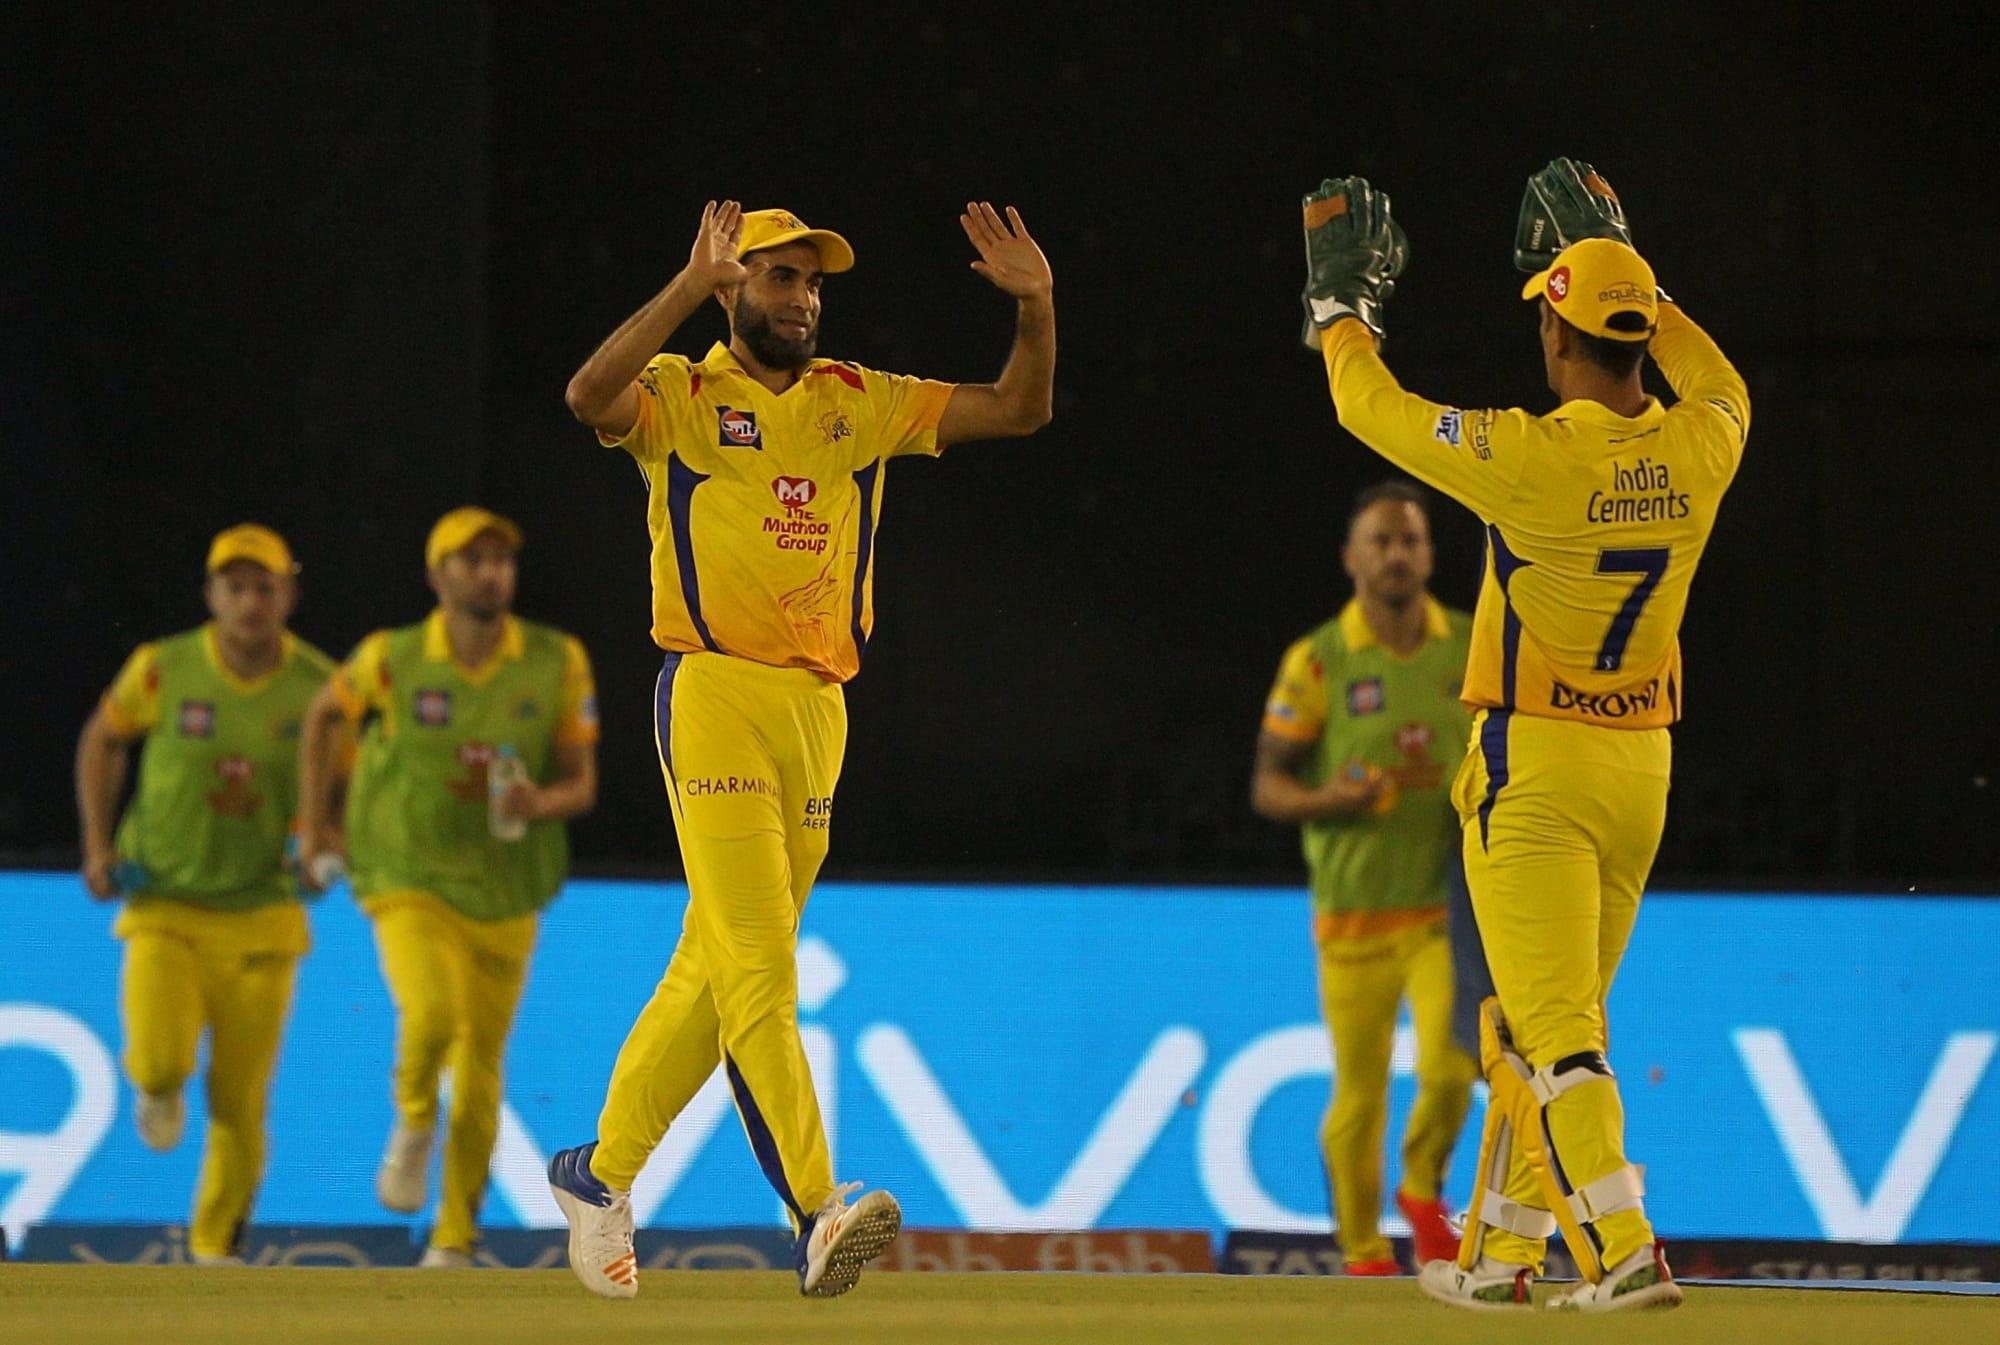 Amid Chris Gayle Storm, Imran Tahir completes 50 wickets in IPL during CSK vs KXIP ties